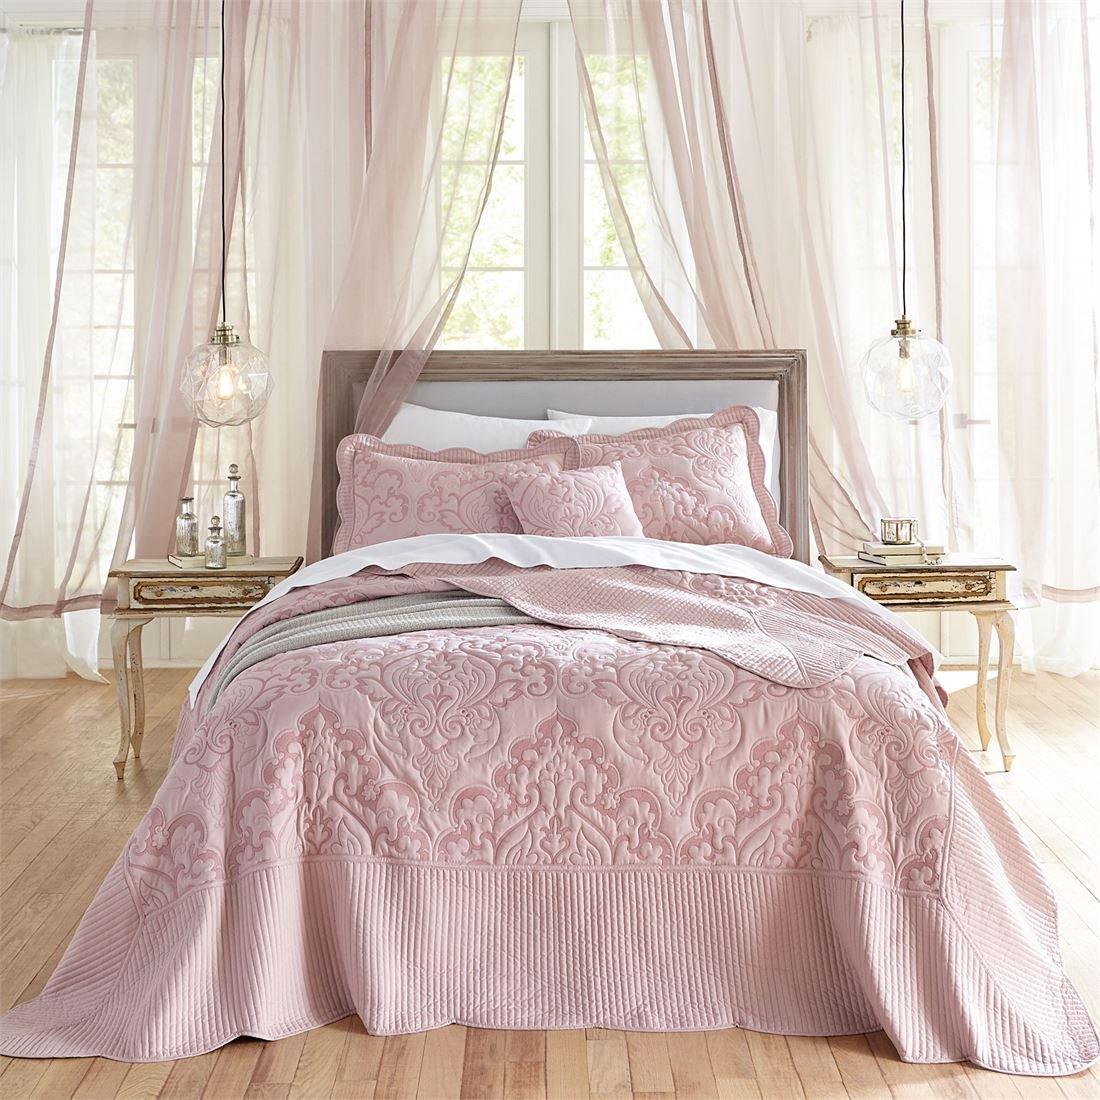 BrylaneHome Amelia Bedspread (Pale Rose,King)